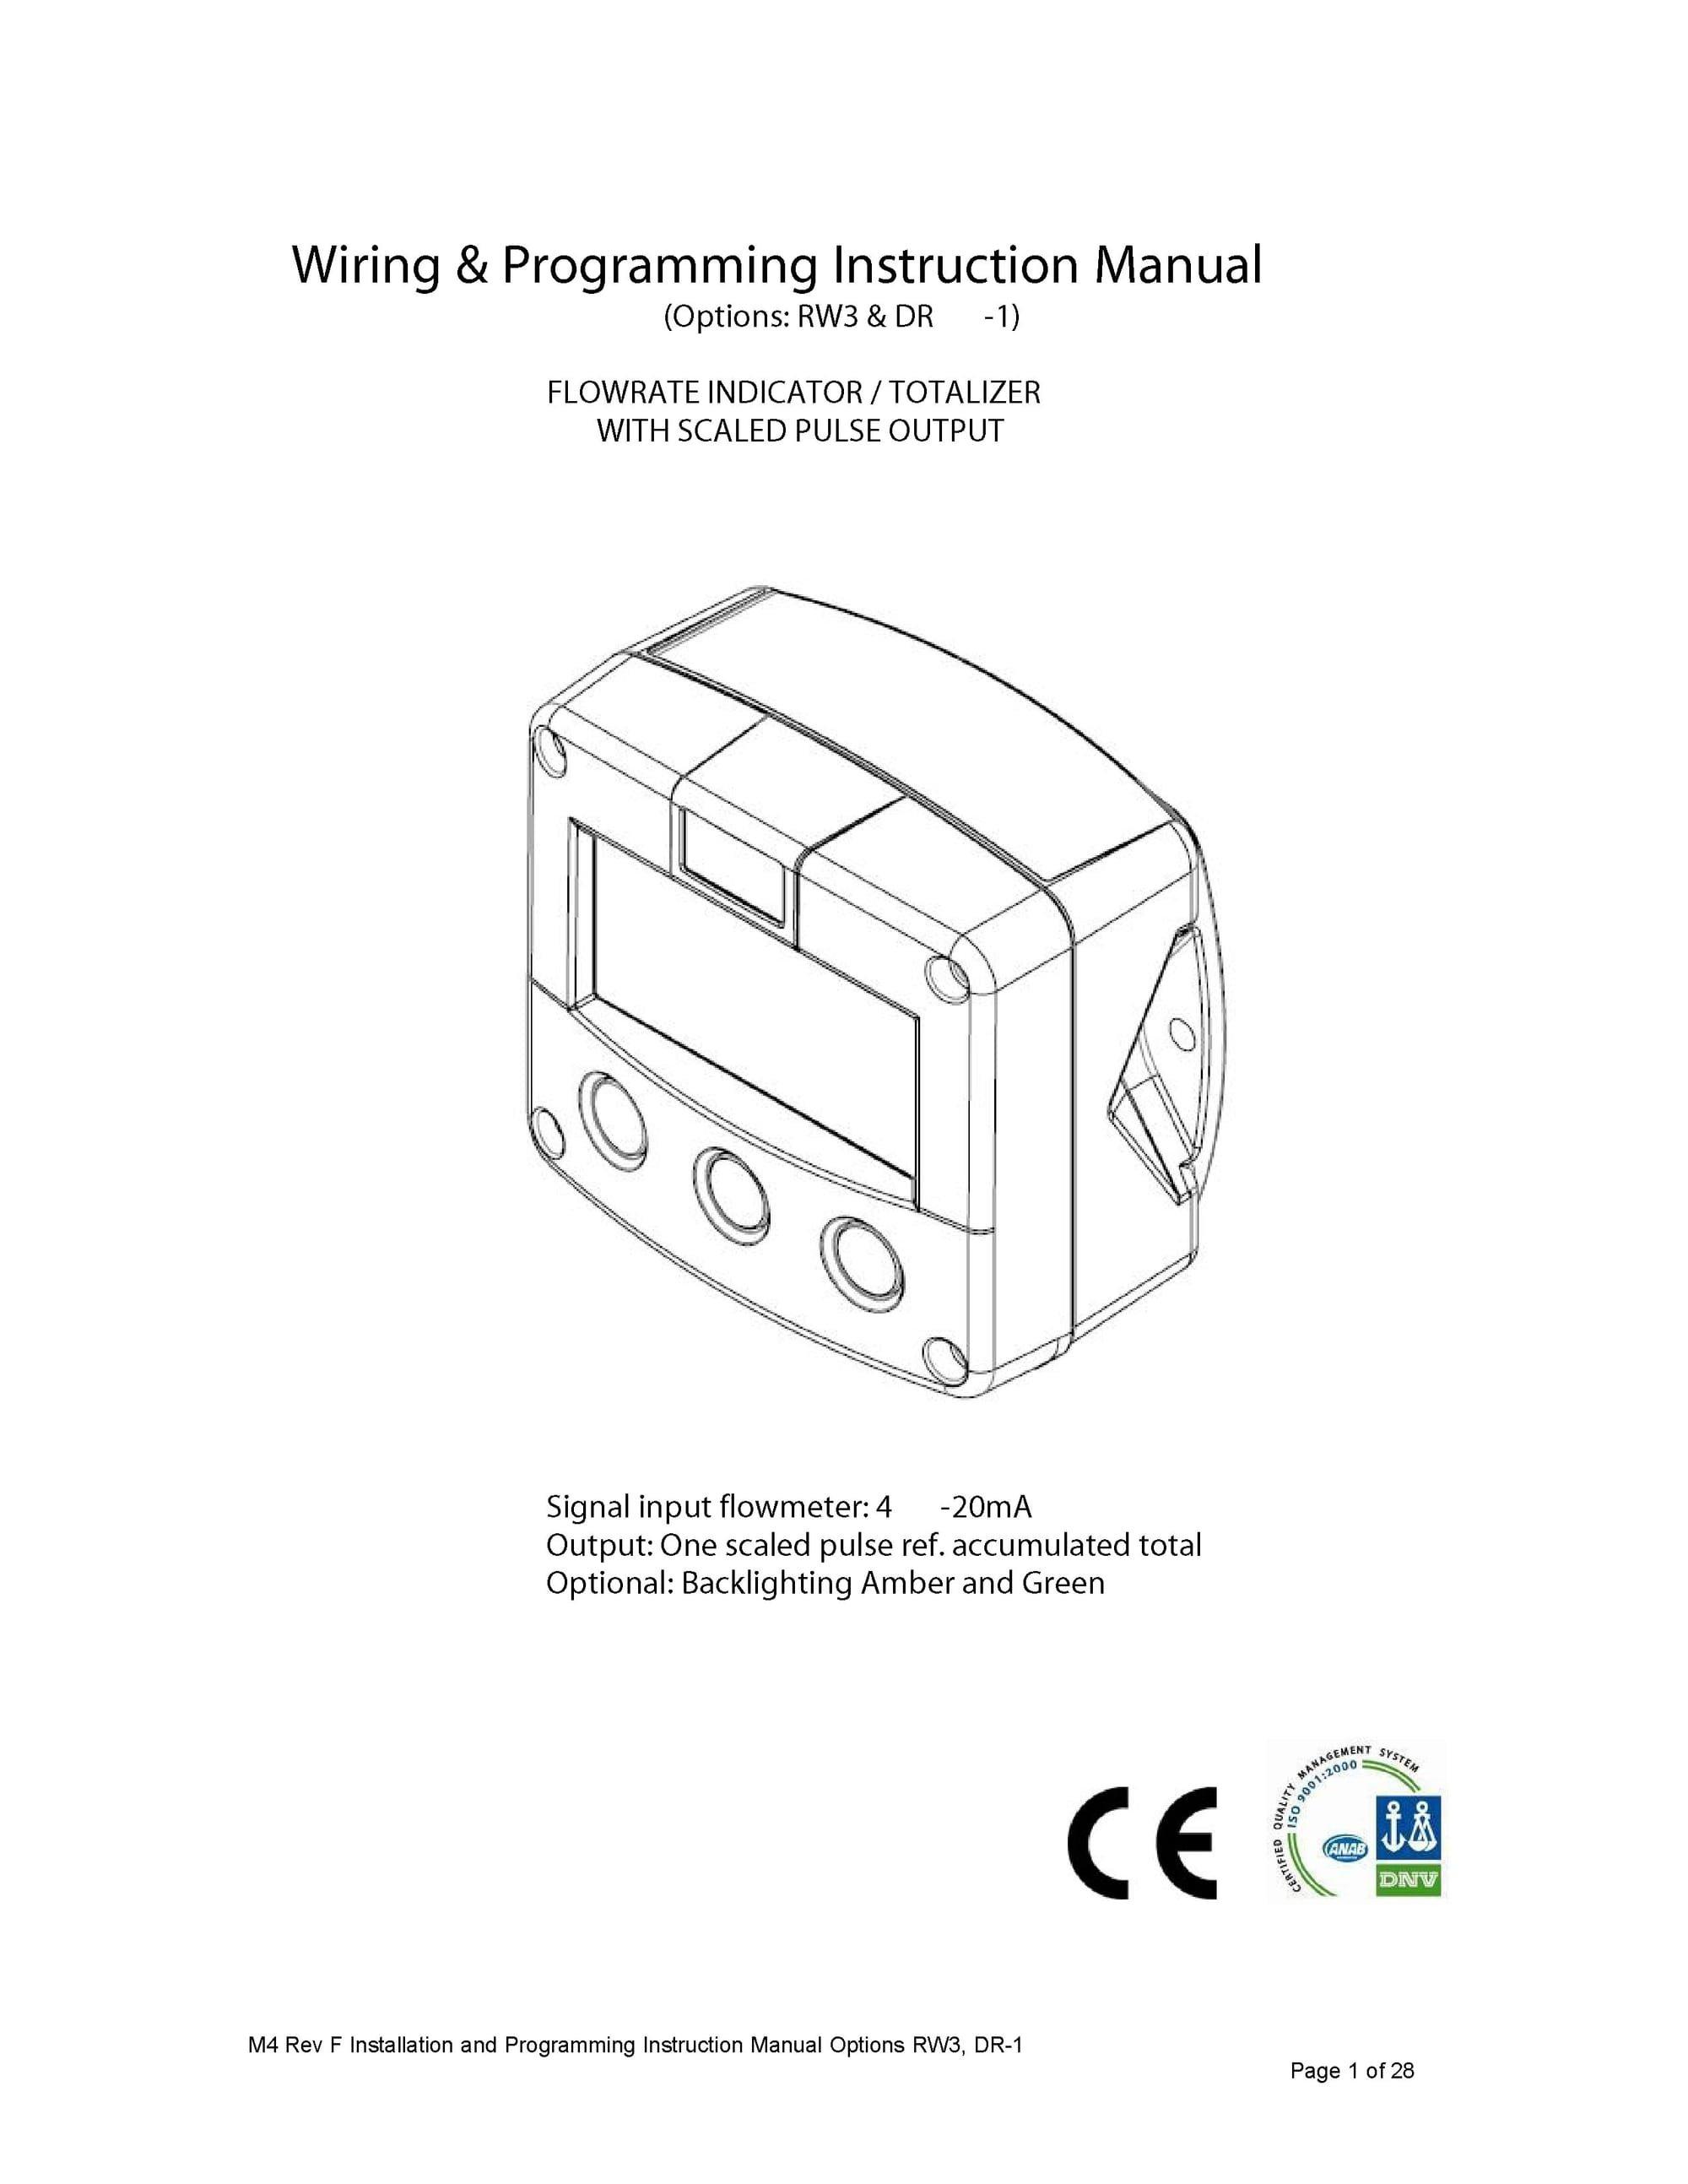 Digital Display Modbus Instruction Manual